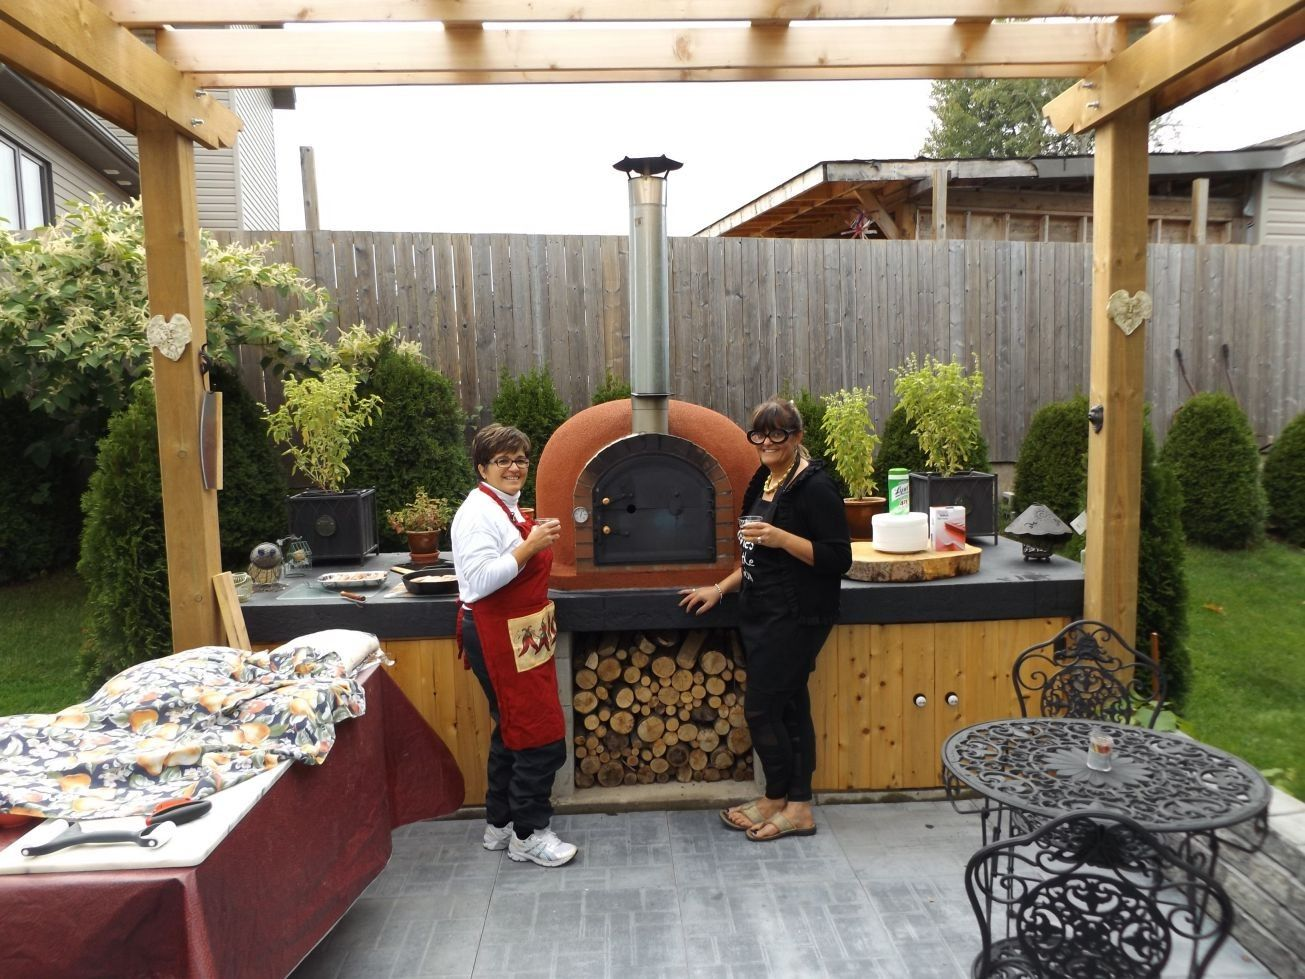 Outdoor Küche Holzofen : Pin von concetta cuozzo auf giardino outdoor küche